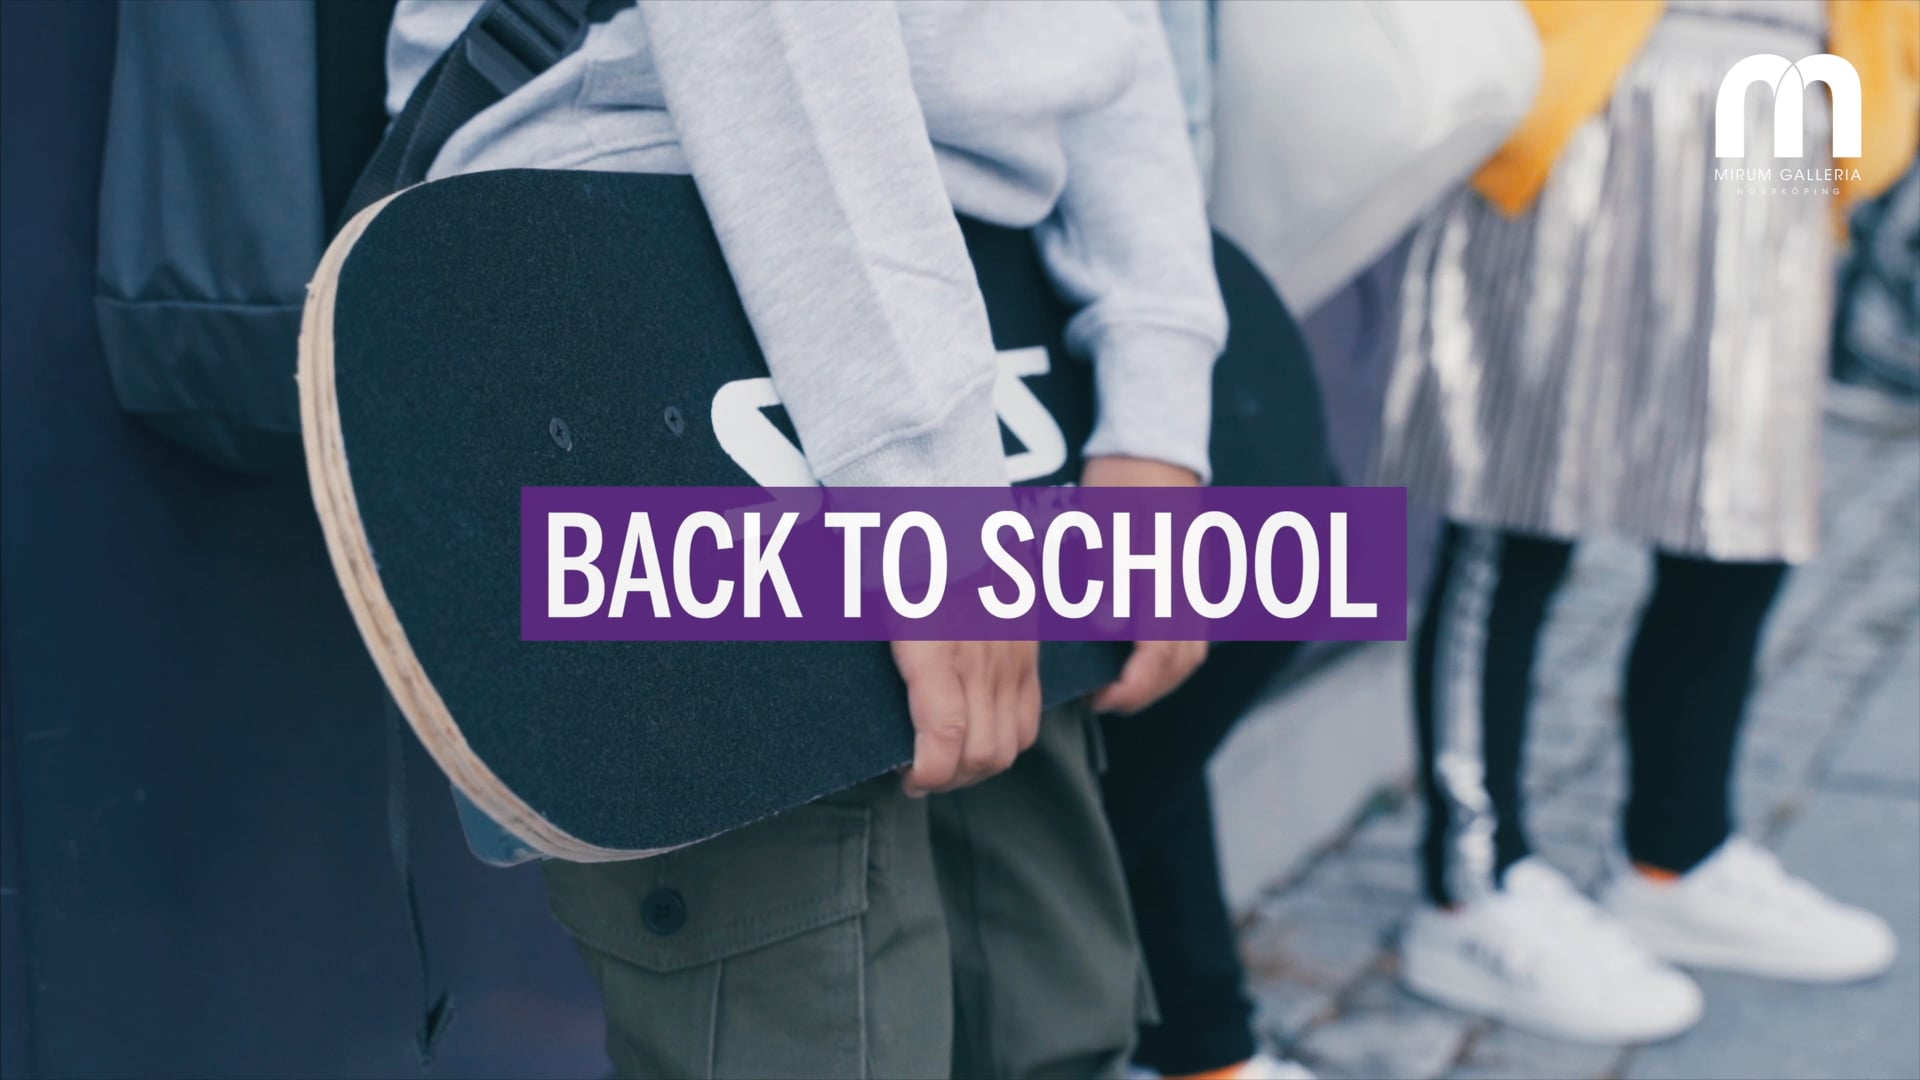 Reklam - Mirum Galleria Back to school